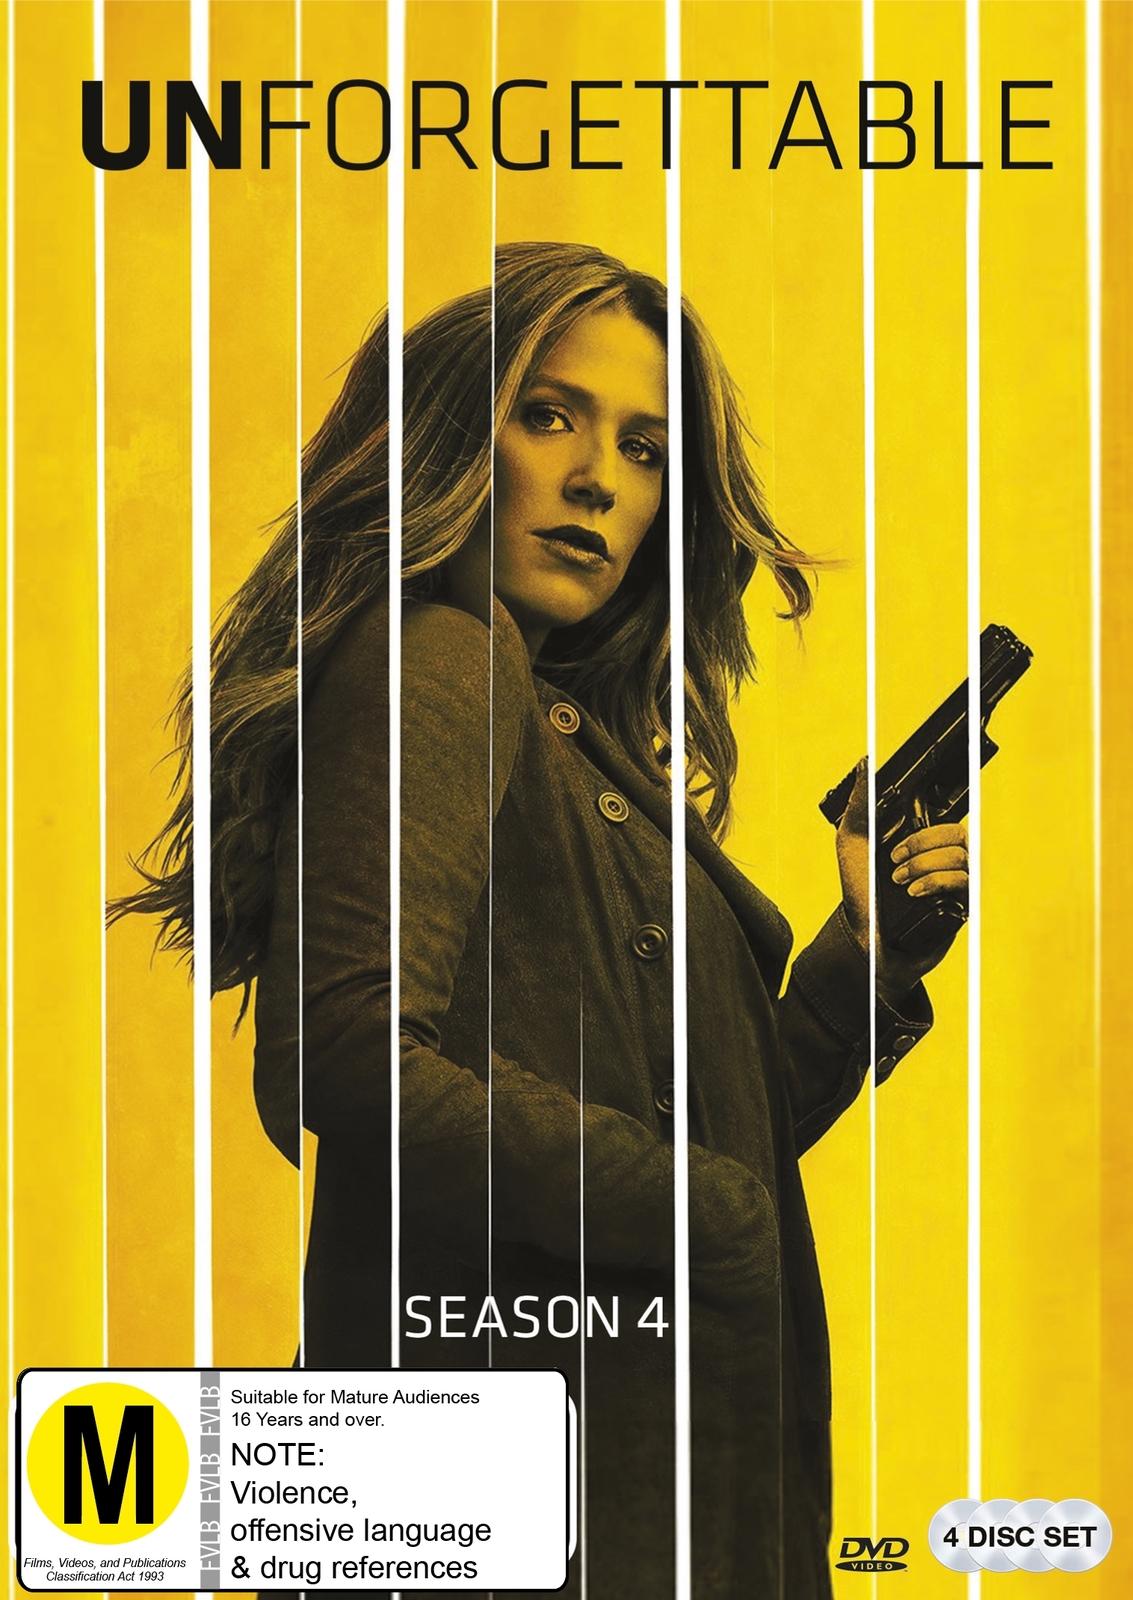 Unforgettable - Season 4 on DVD image